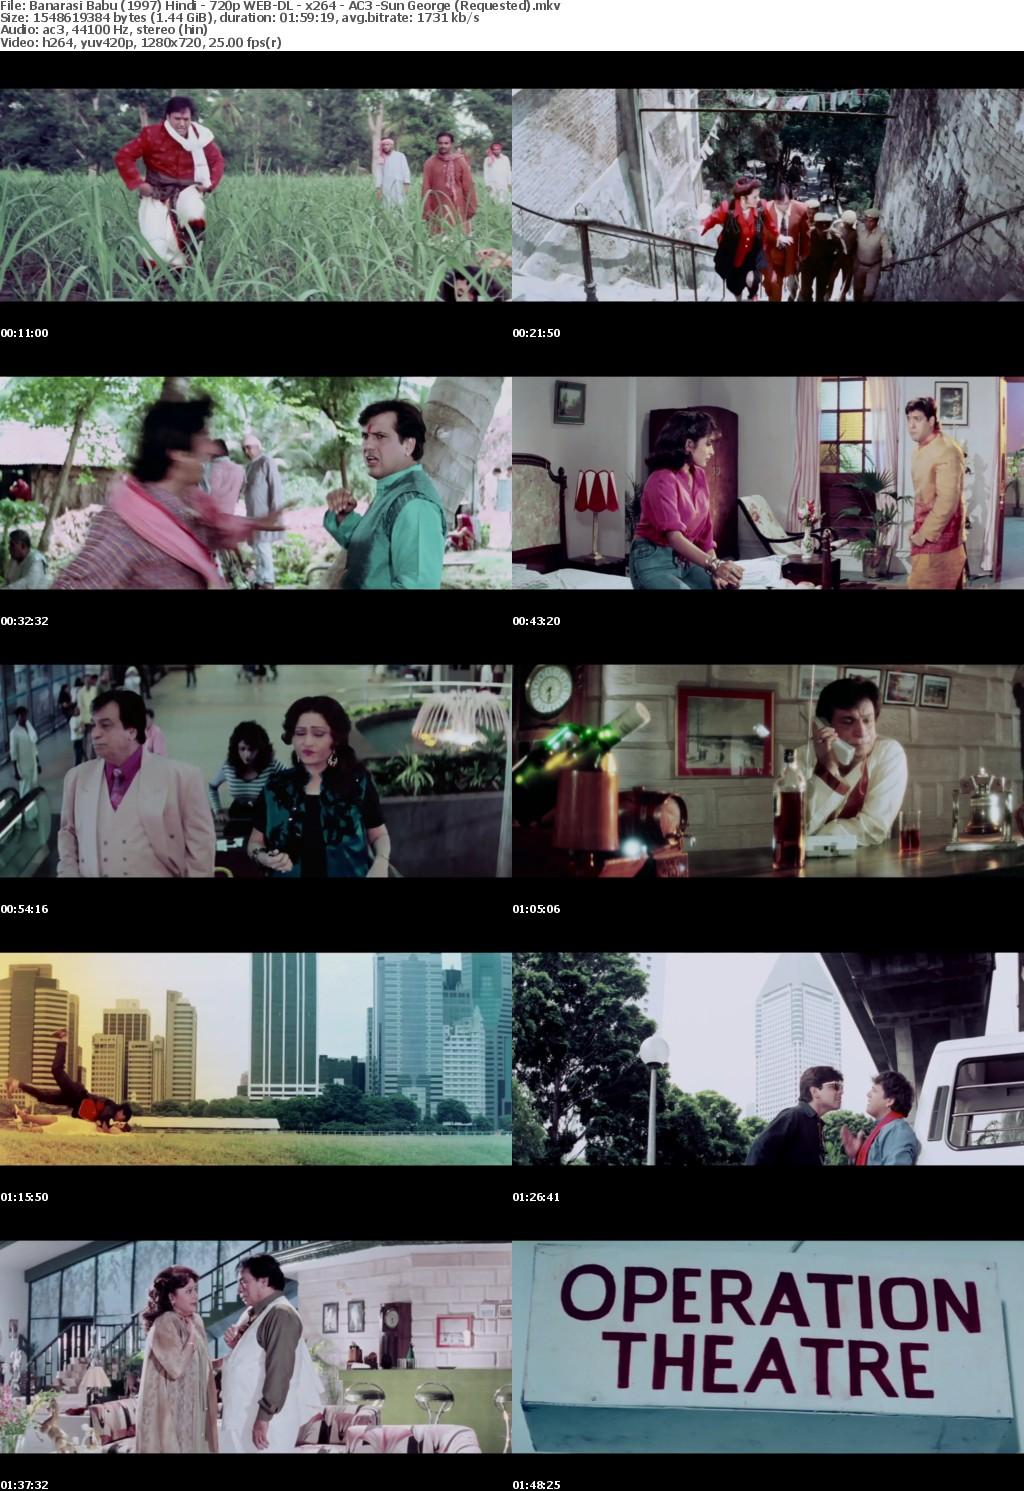 Banarasi Babu (1997) Hindi - 720p WEB-DL - x264 - AC3 -Sun George (Requested)